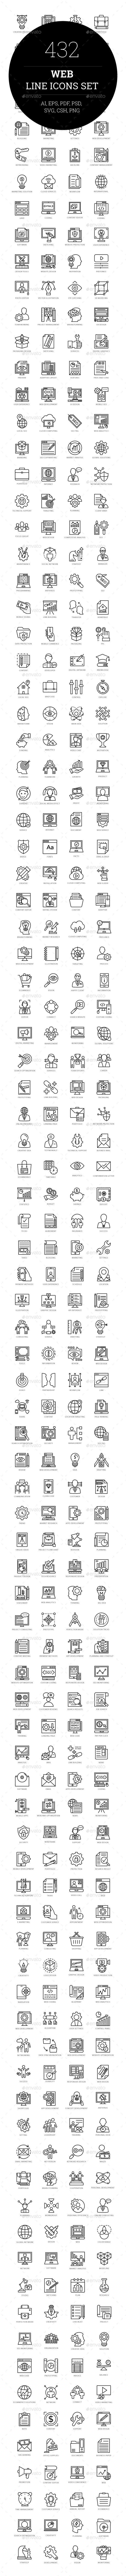 GraphicRiver 432 Web Line Icons 20792946